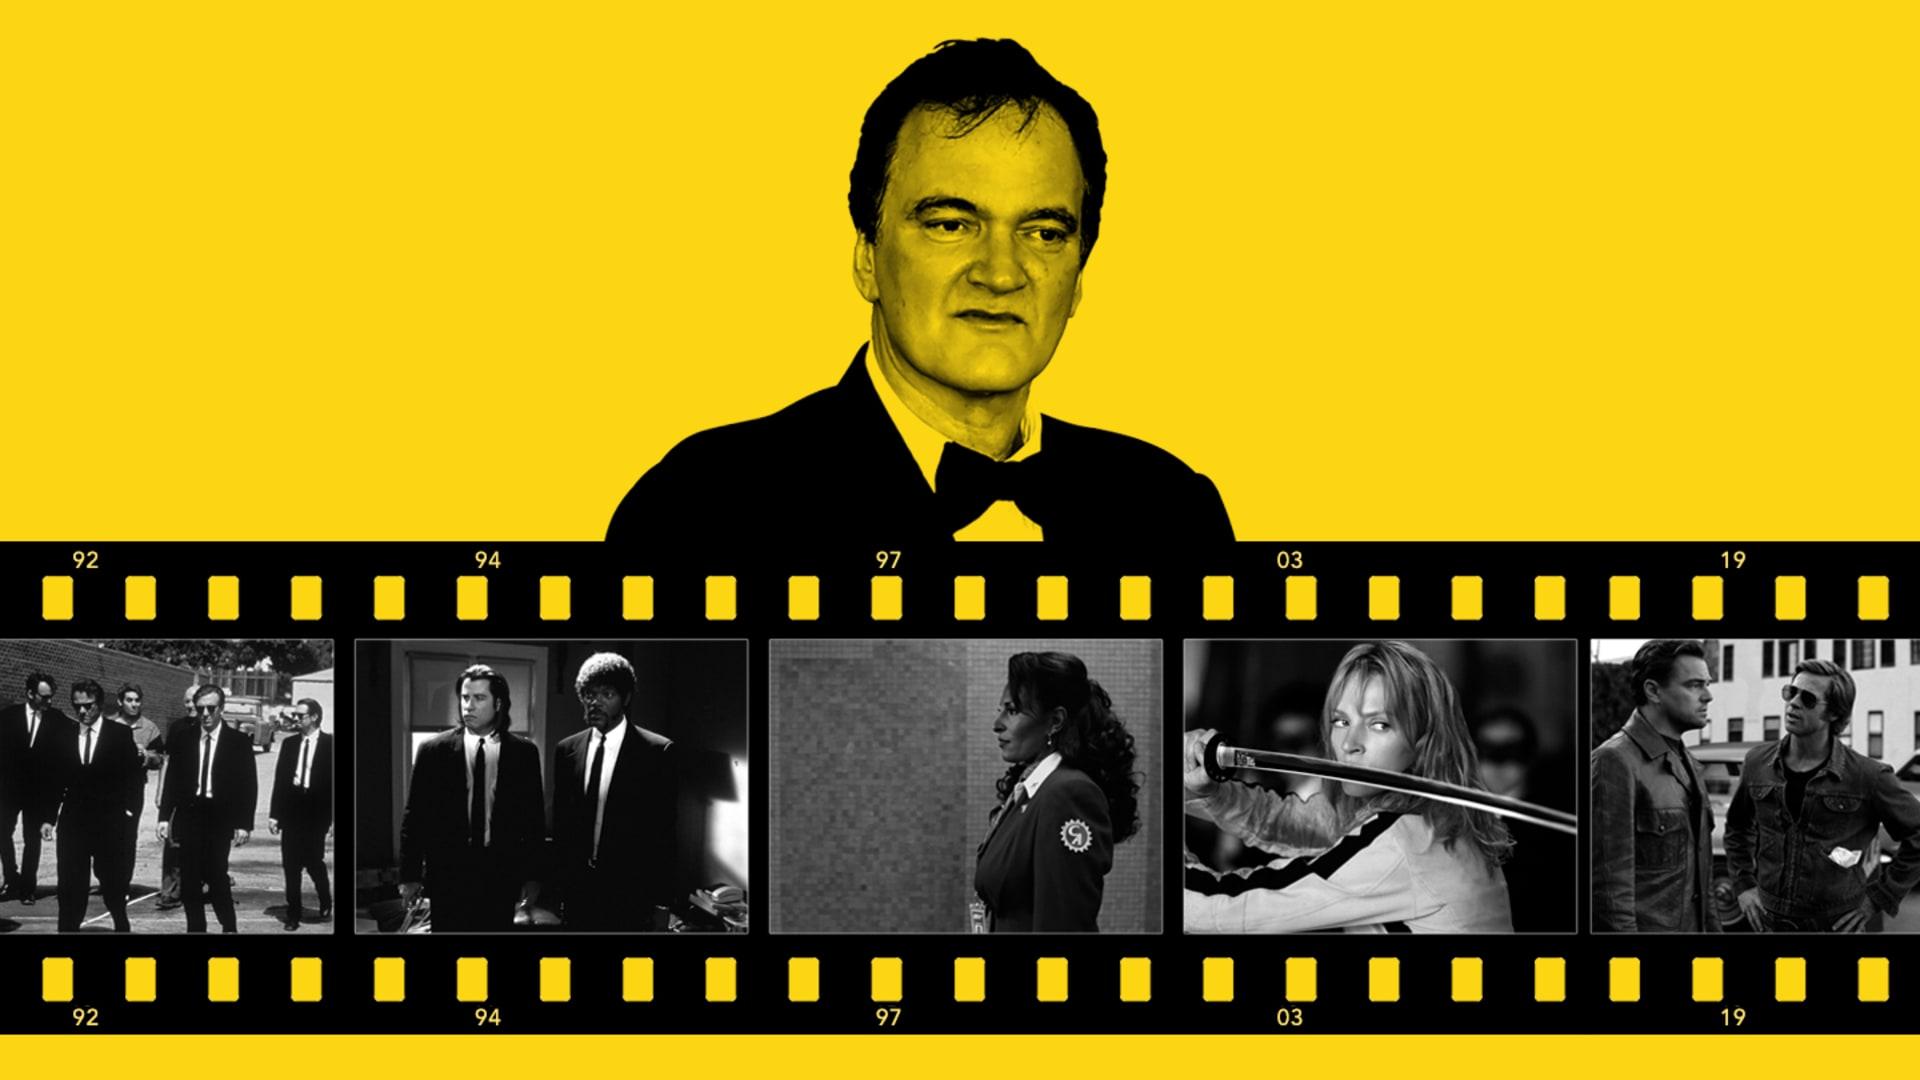 quentin tarantino movies ranked lead - چرا کوئنتین تارانتینو گفته است پس از ساخت فیلم دهم خود بازنشسته خواهد شد؟